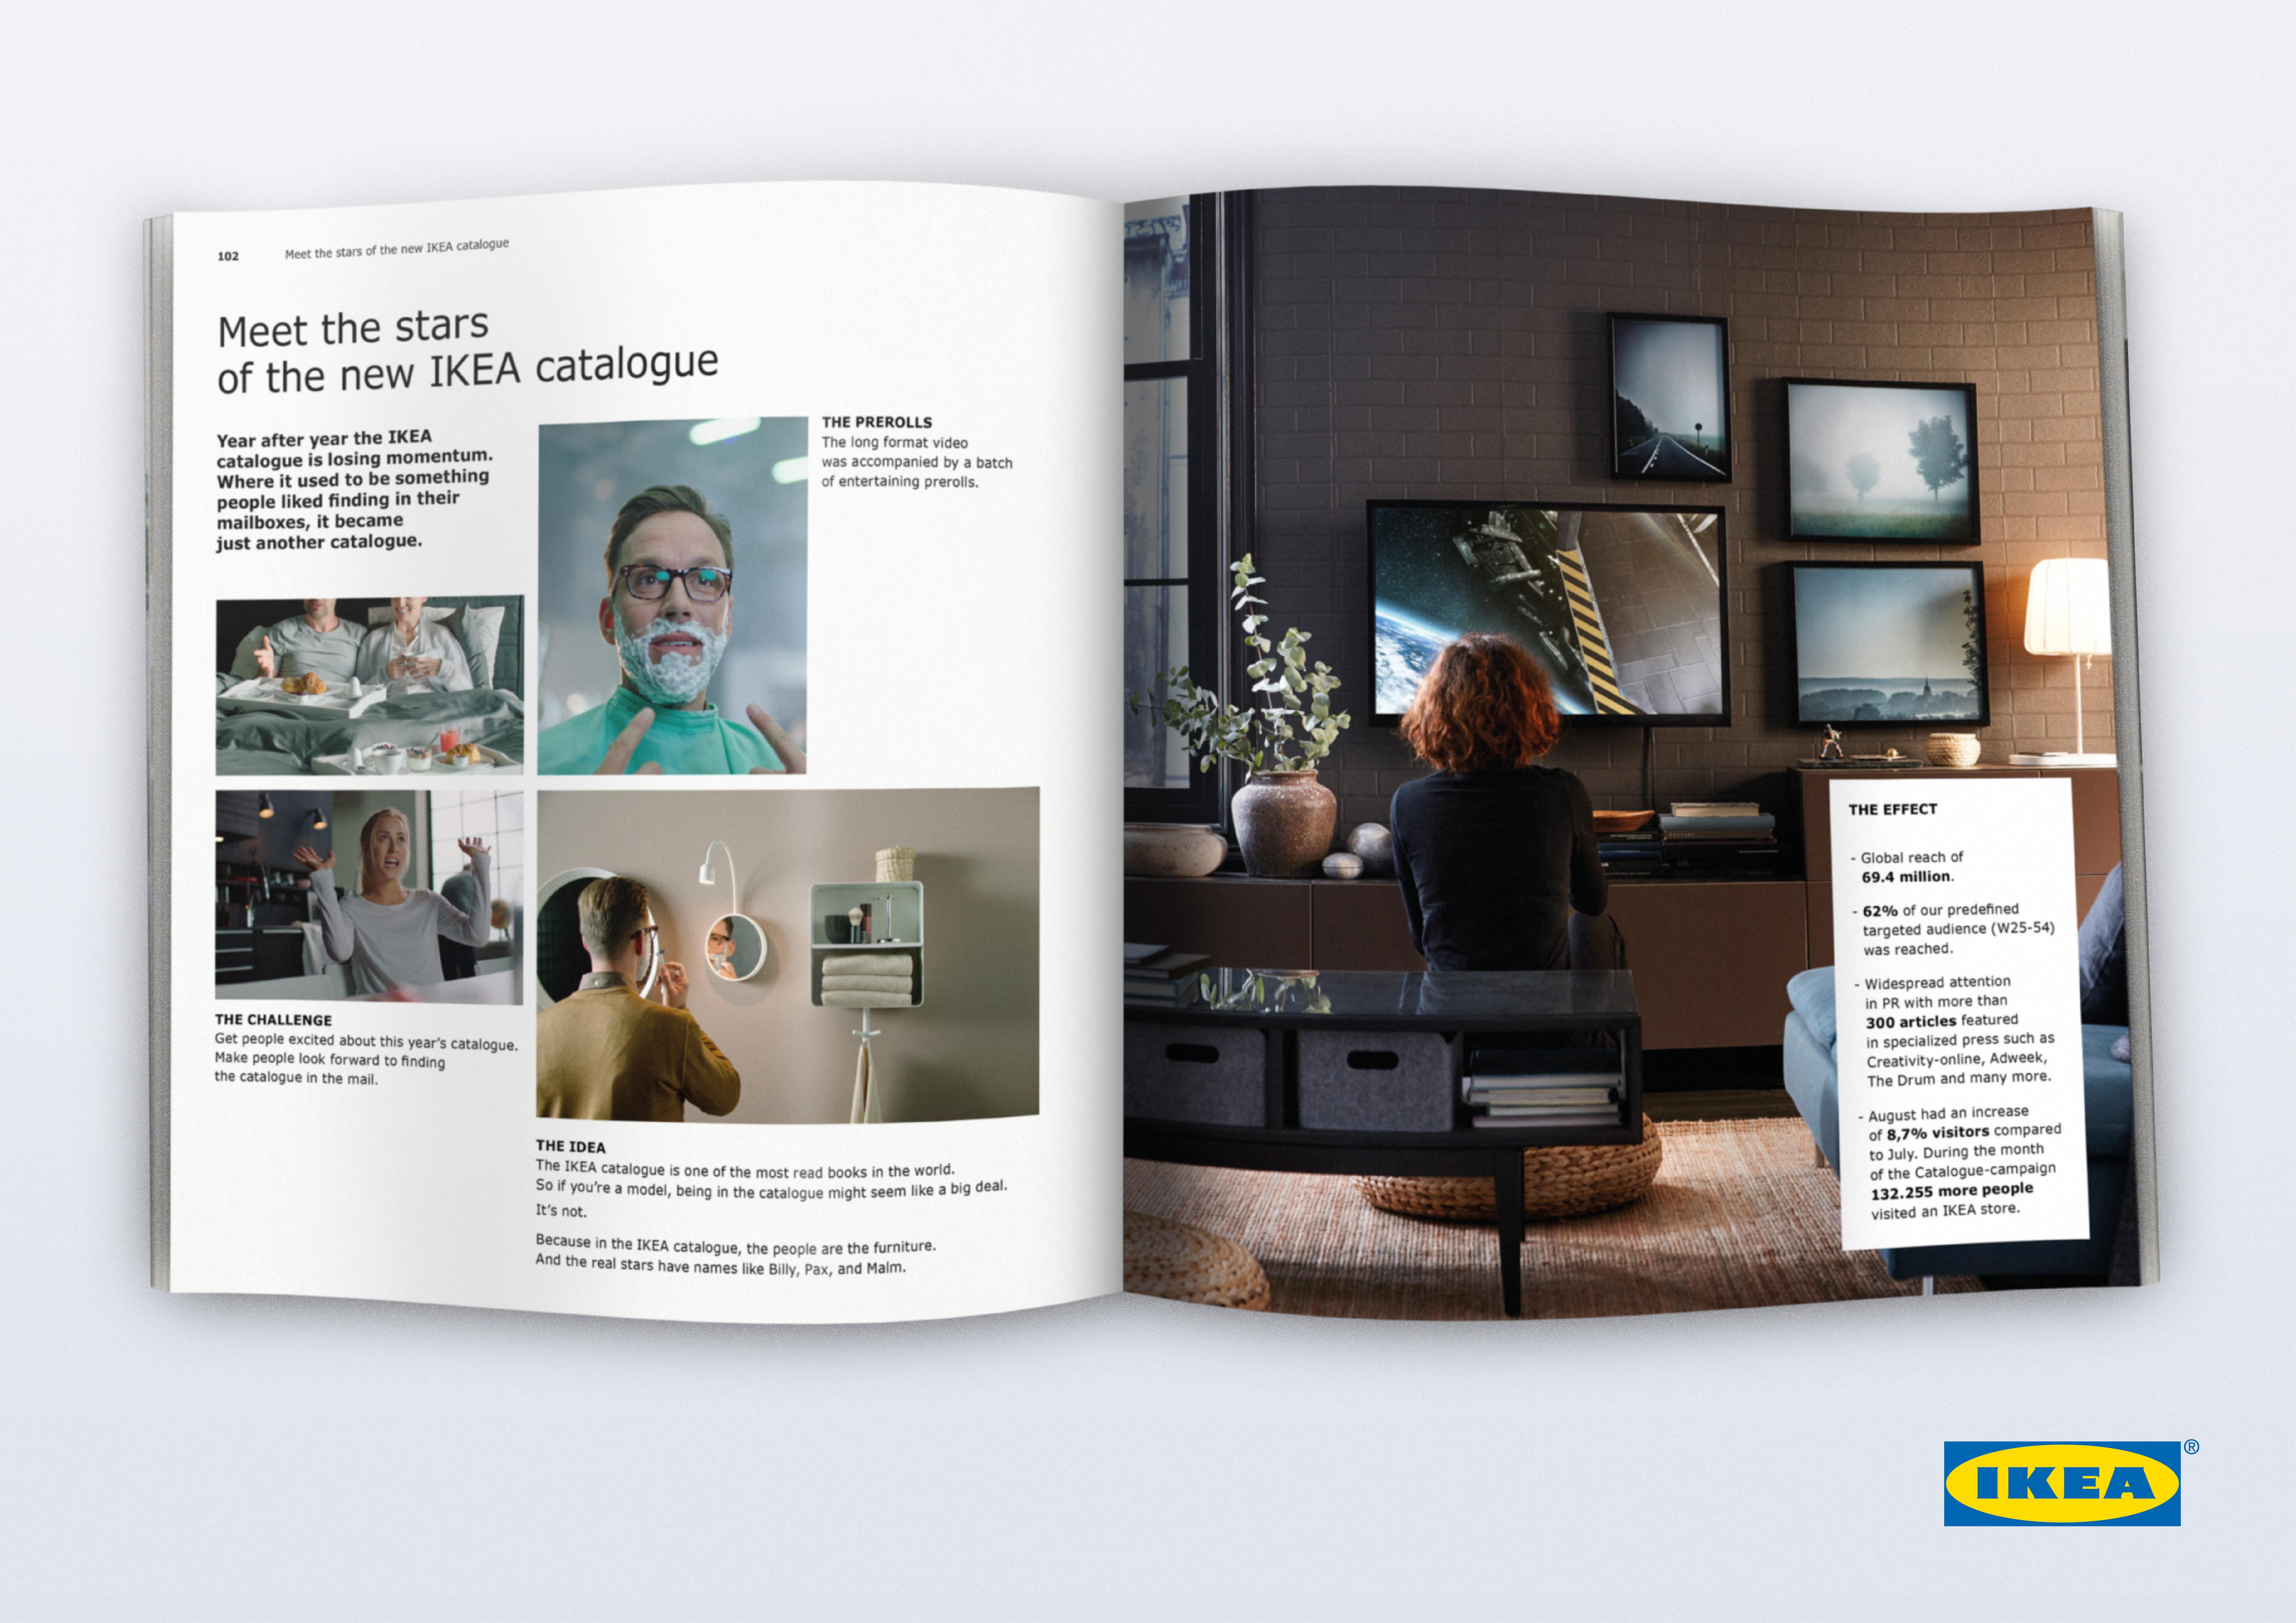 Meet The Real Stars Of The IKEA Catalogue Thumbnail